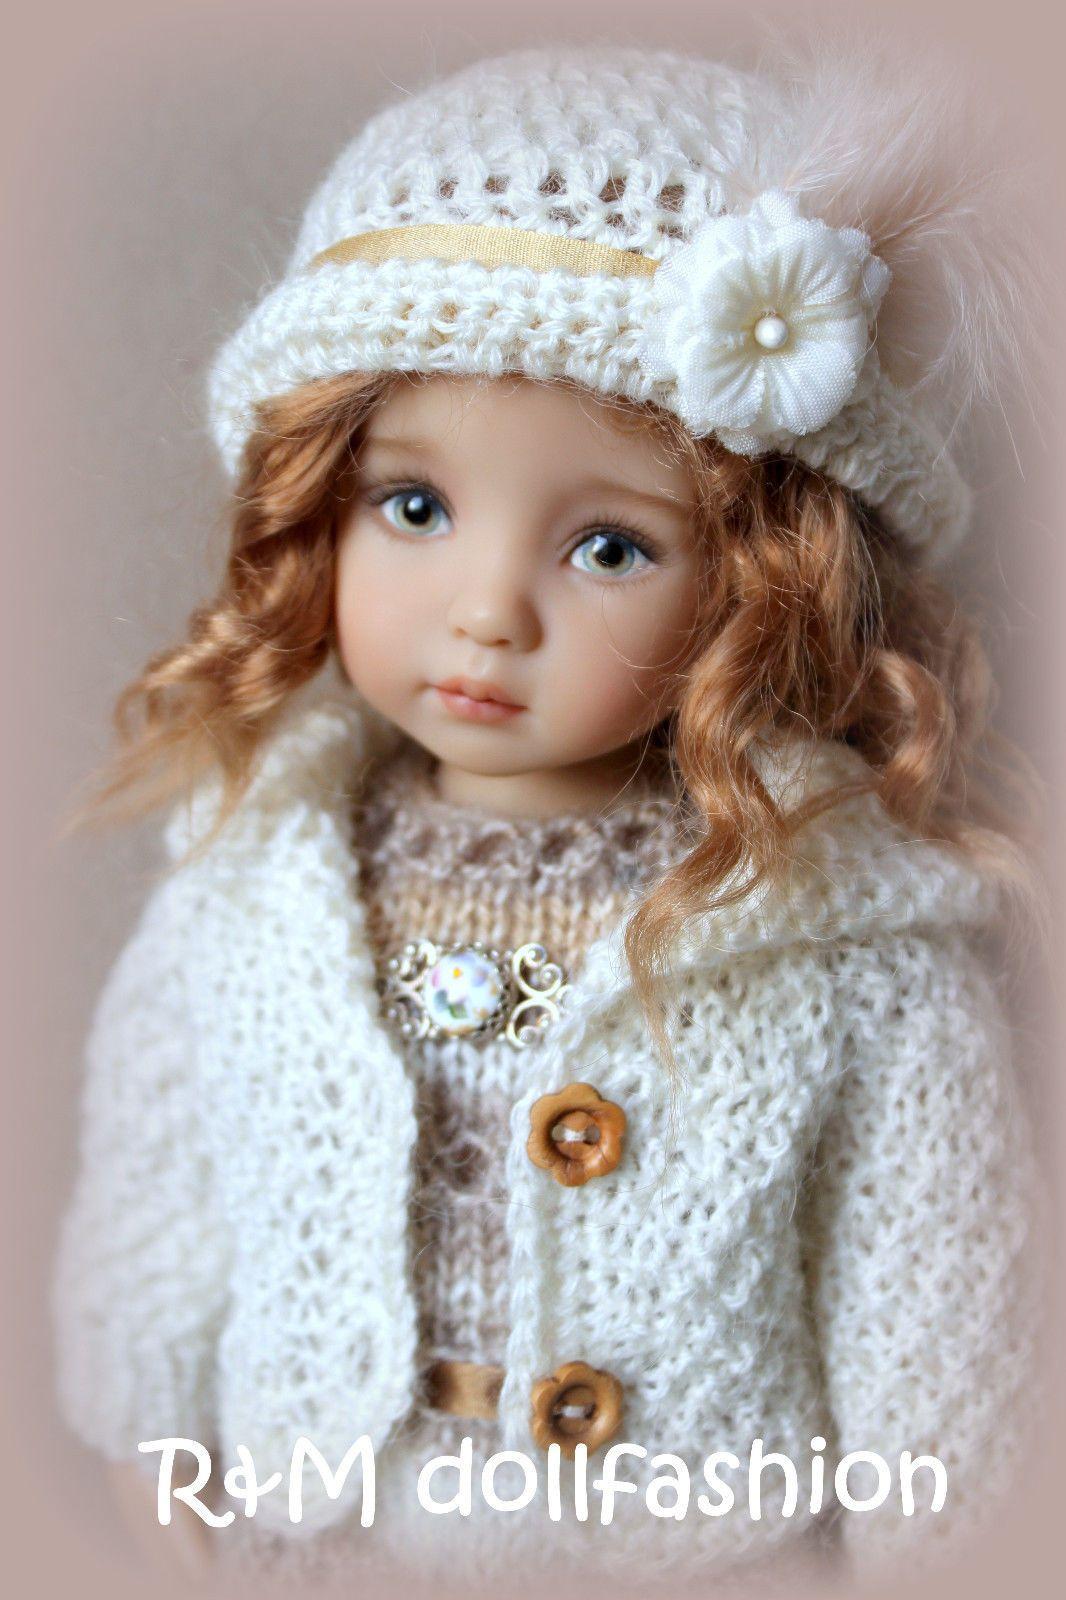 "R M Dollfashion Treasure Line Handknit Set for Effner Little Darling 13"" Dolls   eBay"